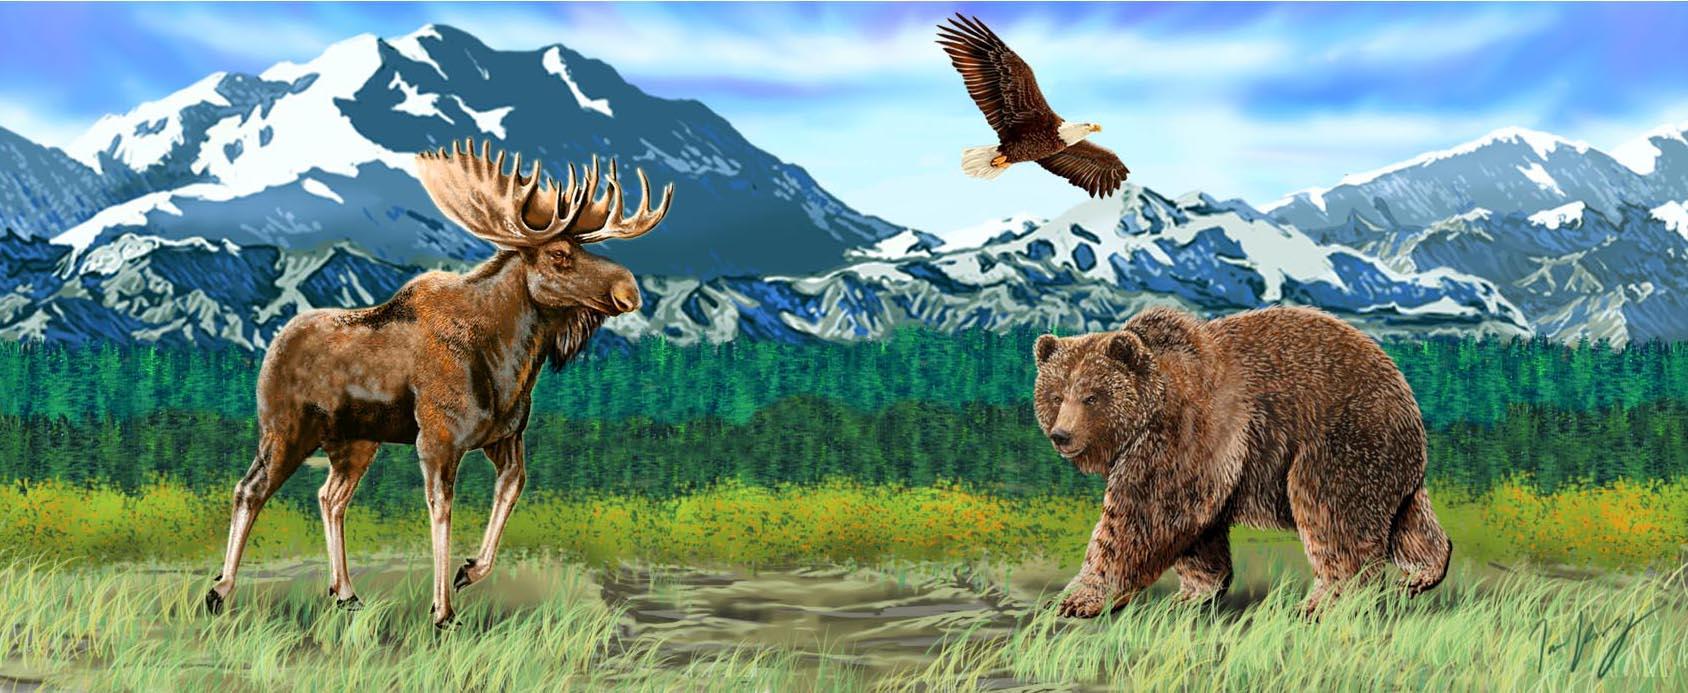 Proud Alaskan Animals